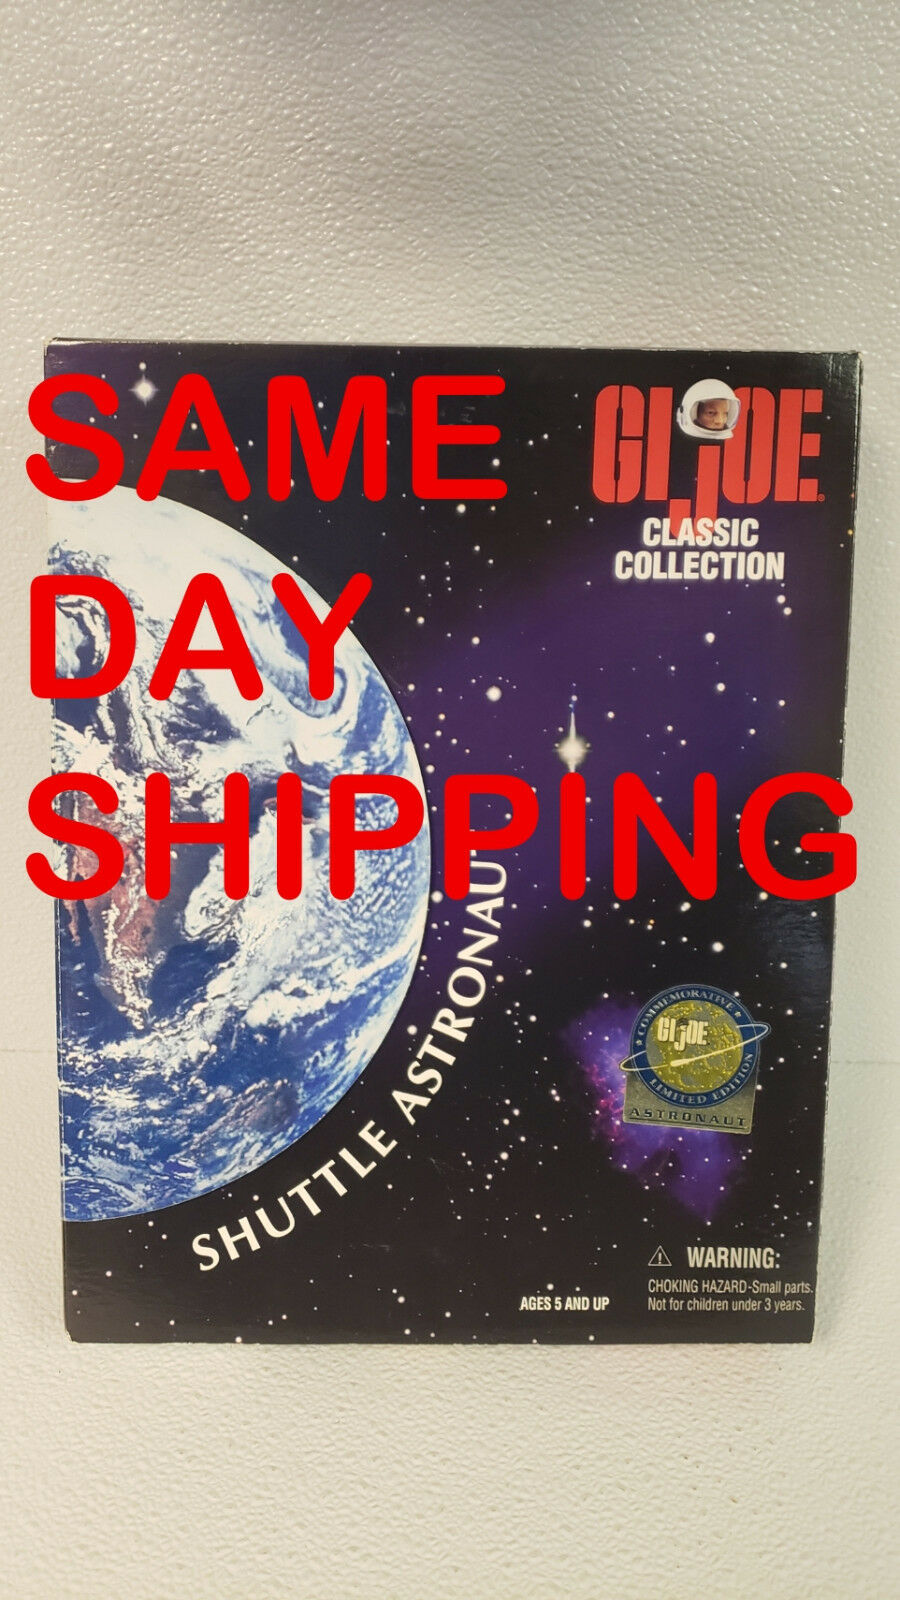 Gi - joe classic collection shuttle - astronaut posten 800204-r2